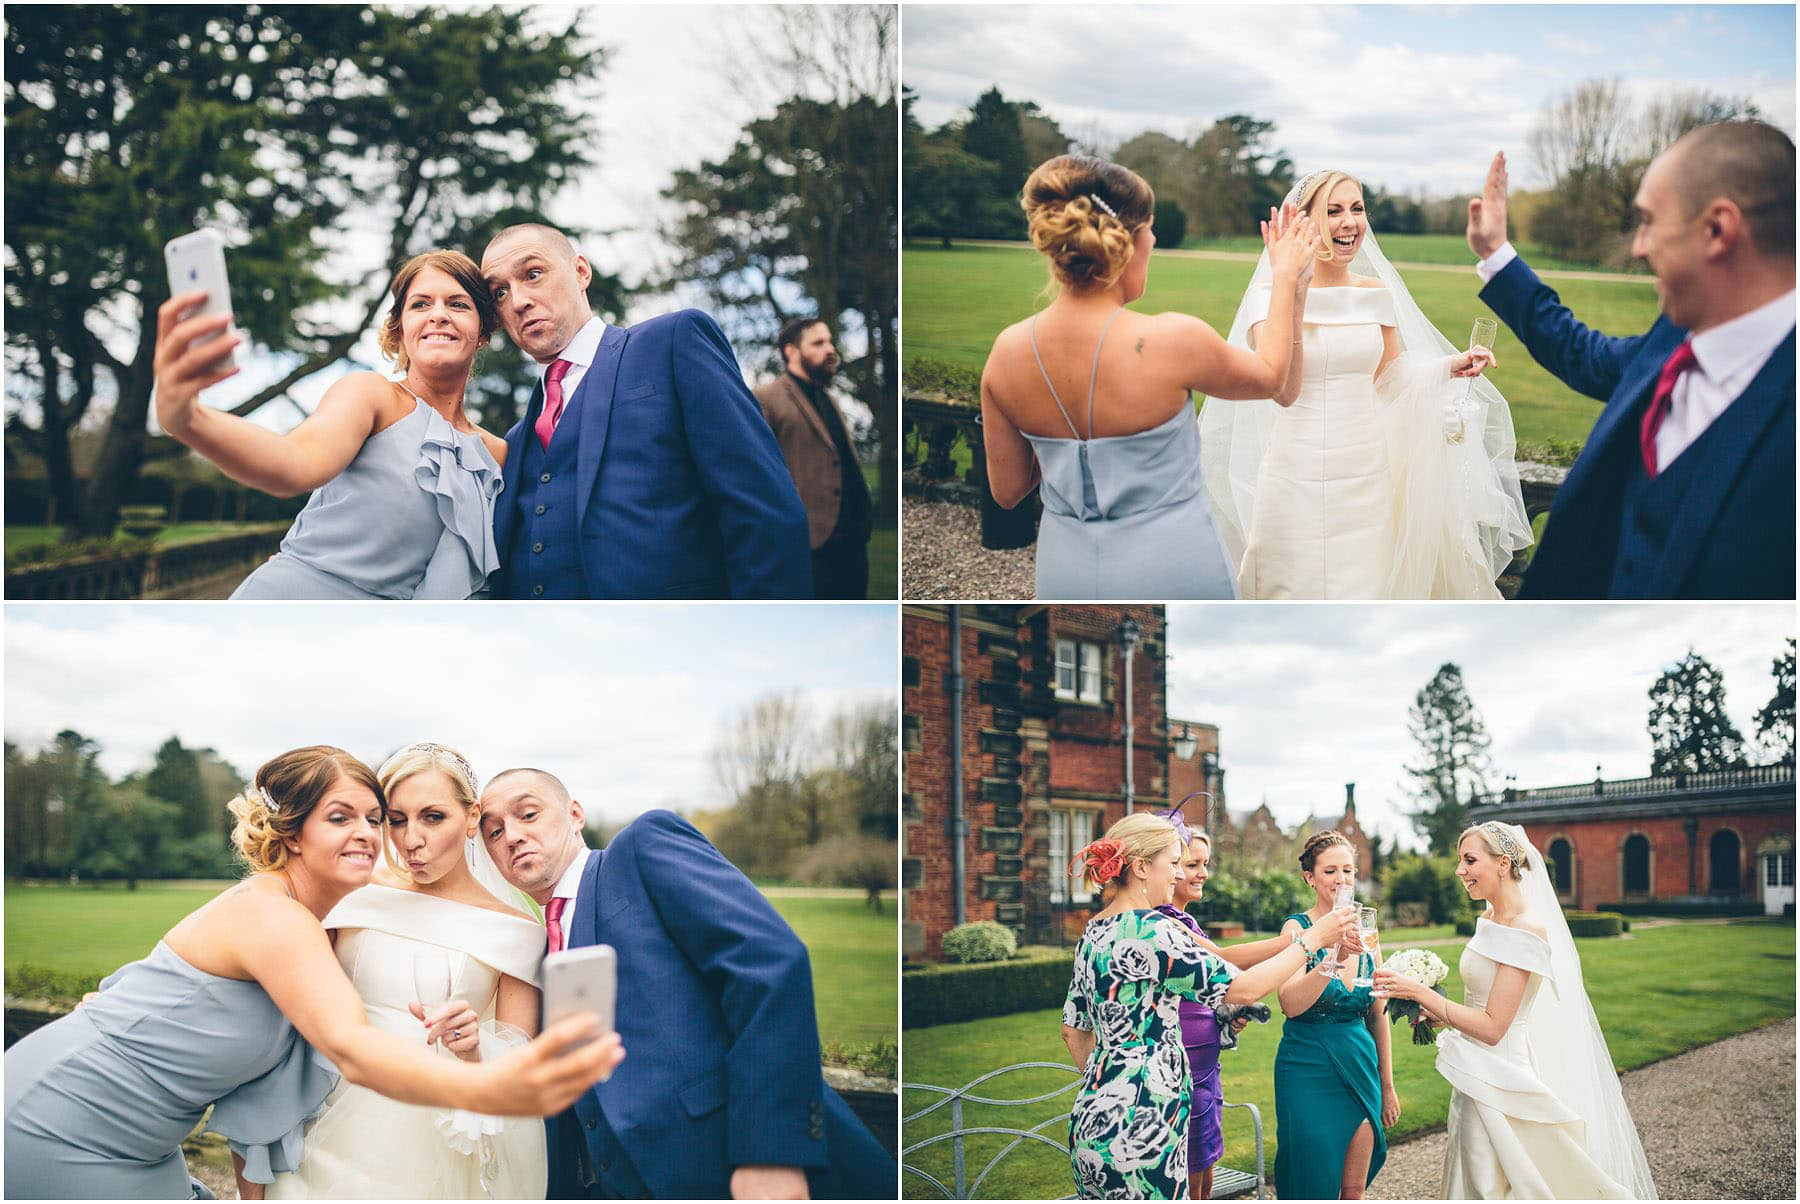 Capesthorne_Hall_Wedding_Photography_0079